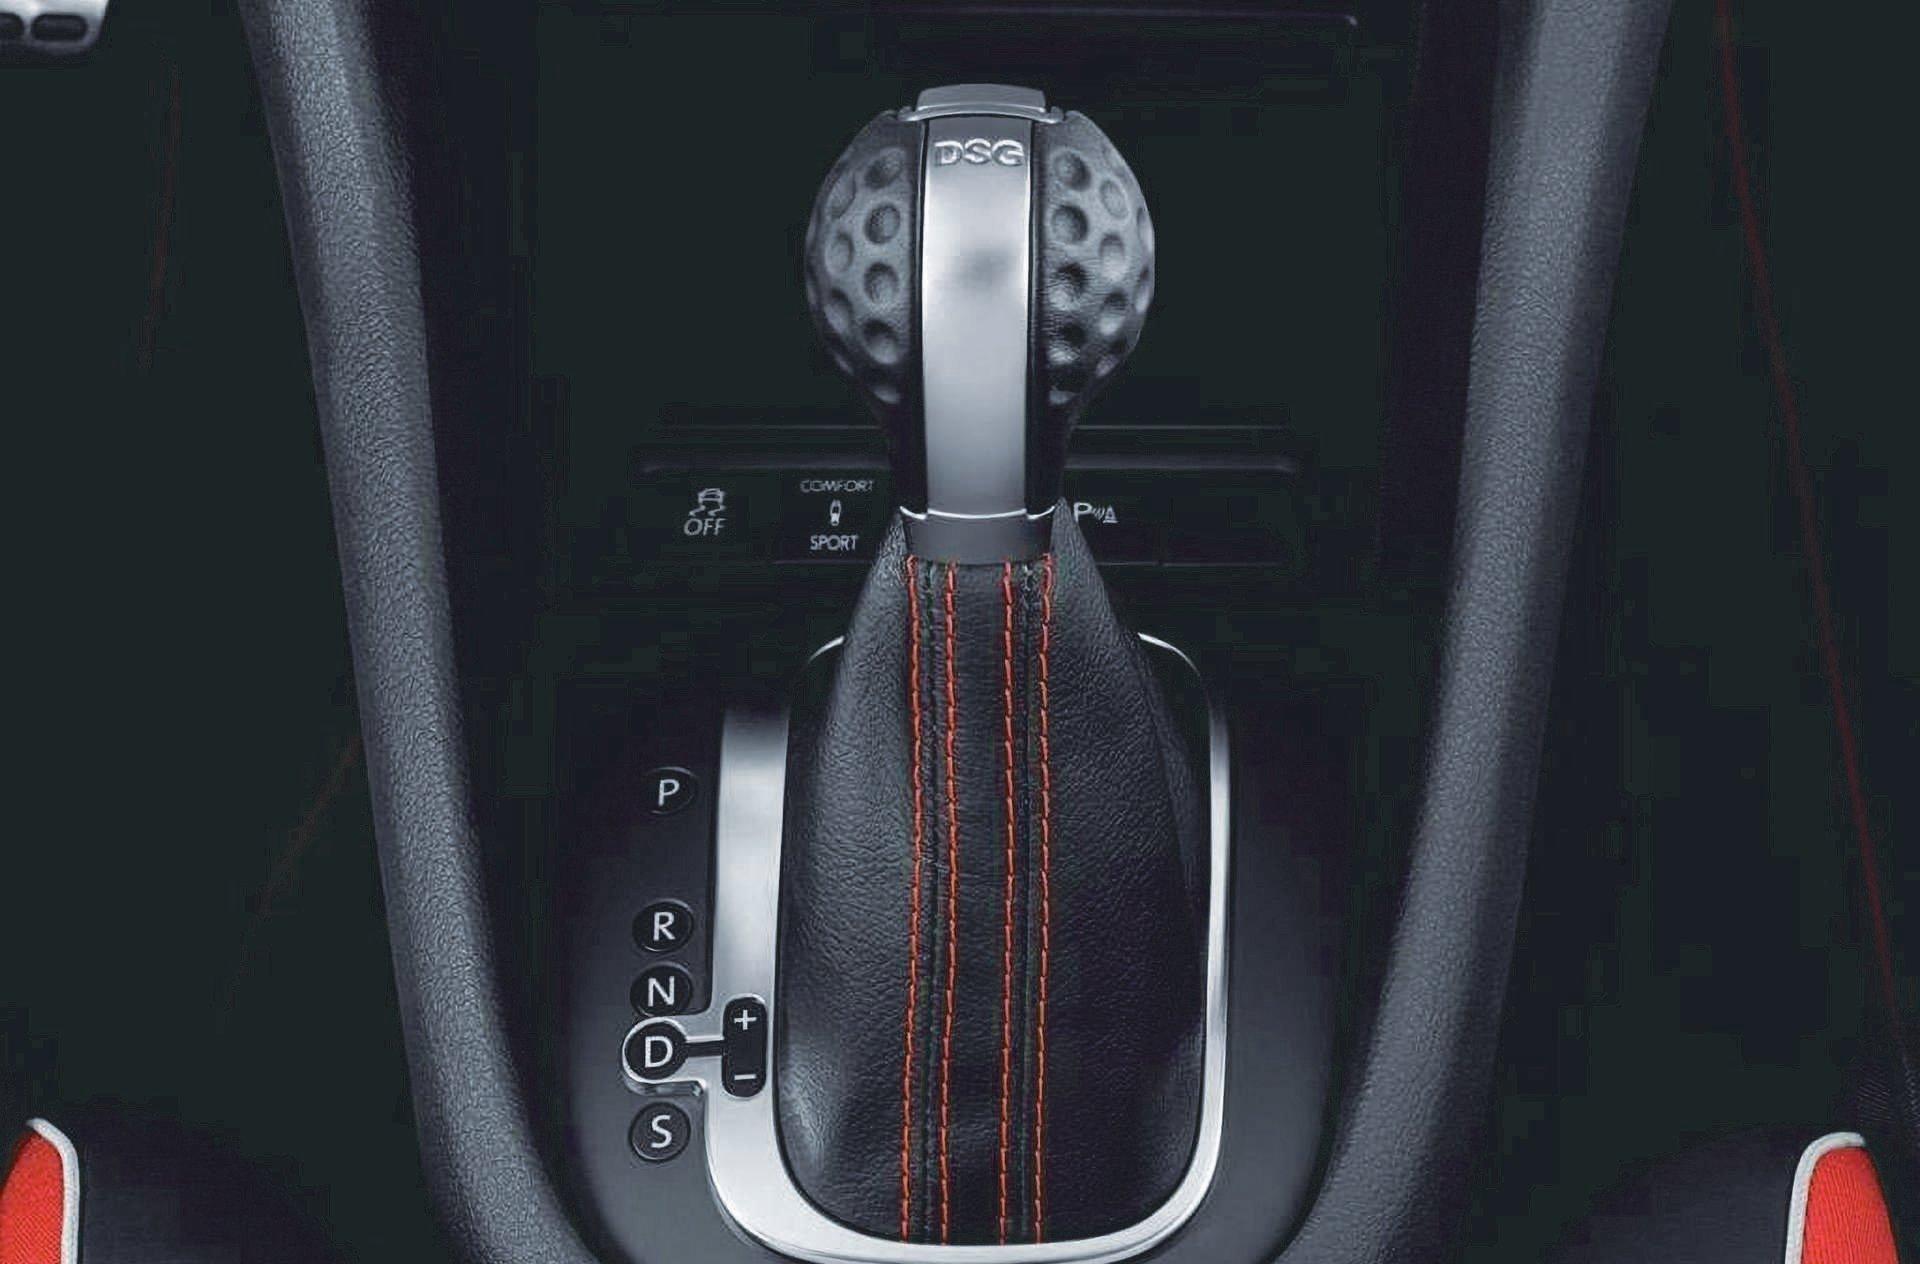 09_VW Audi DSG S Tronic gear selector